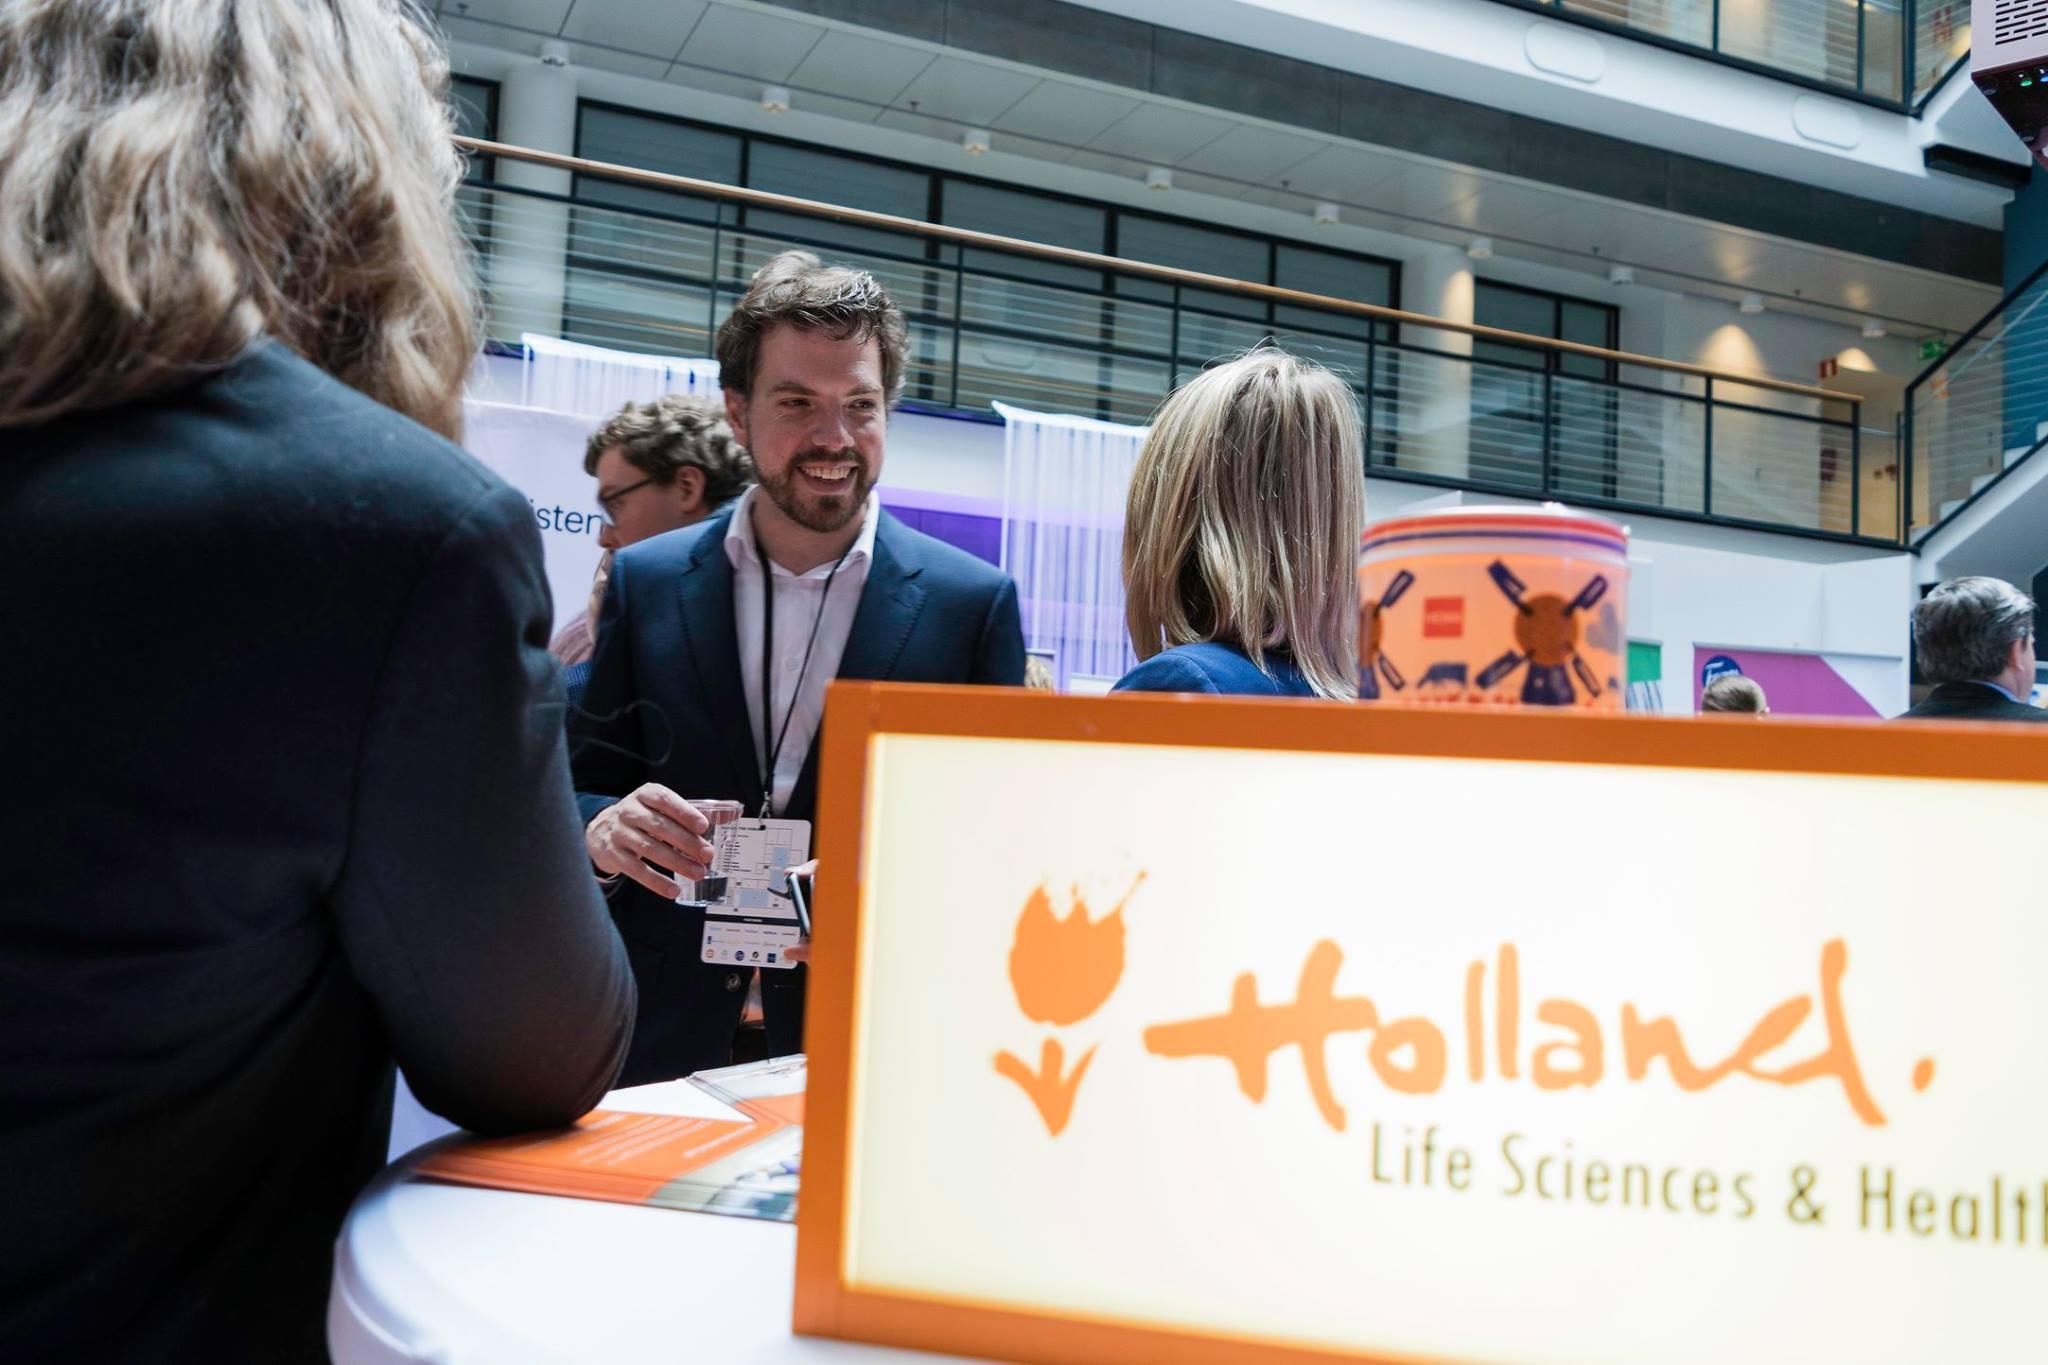 Presenteren op Holland Paviljoen